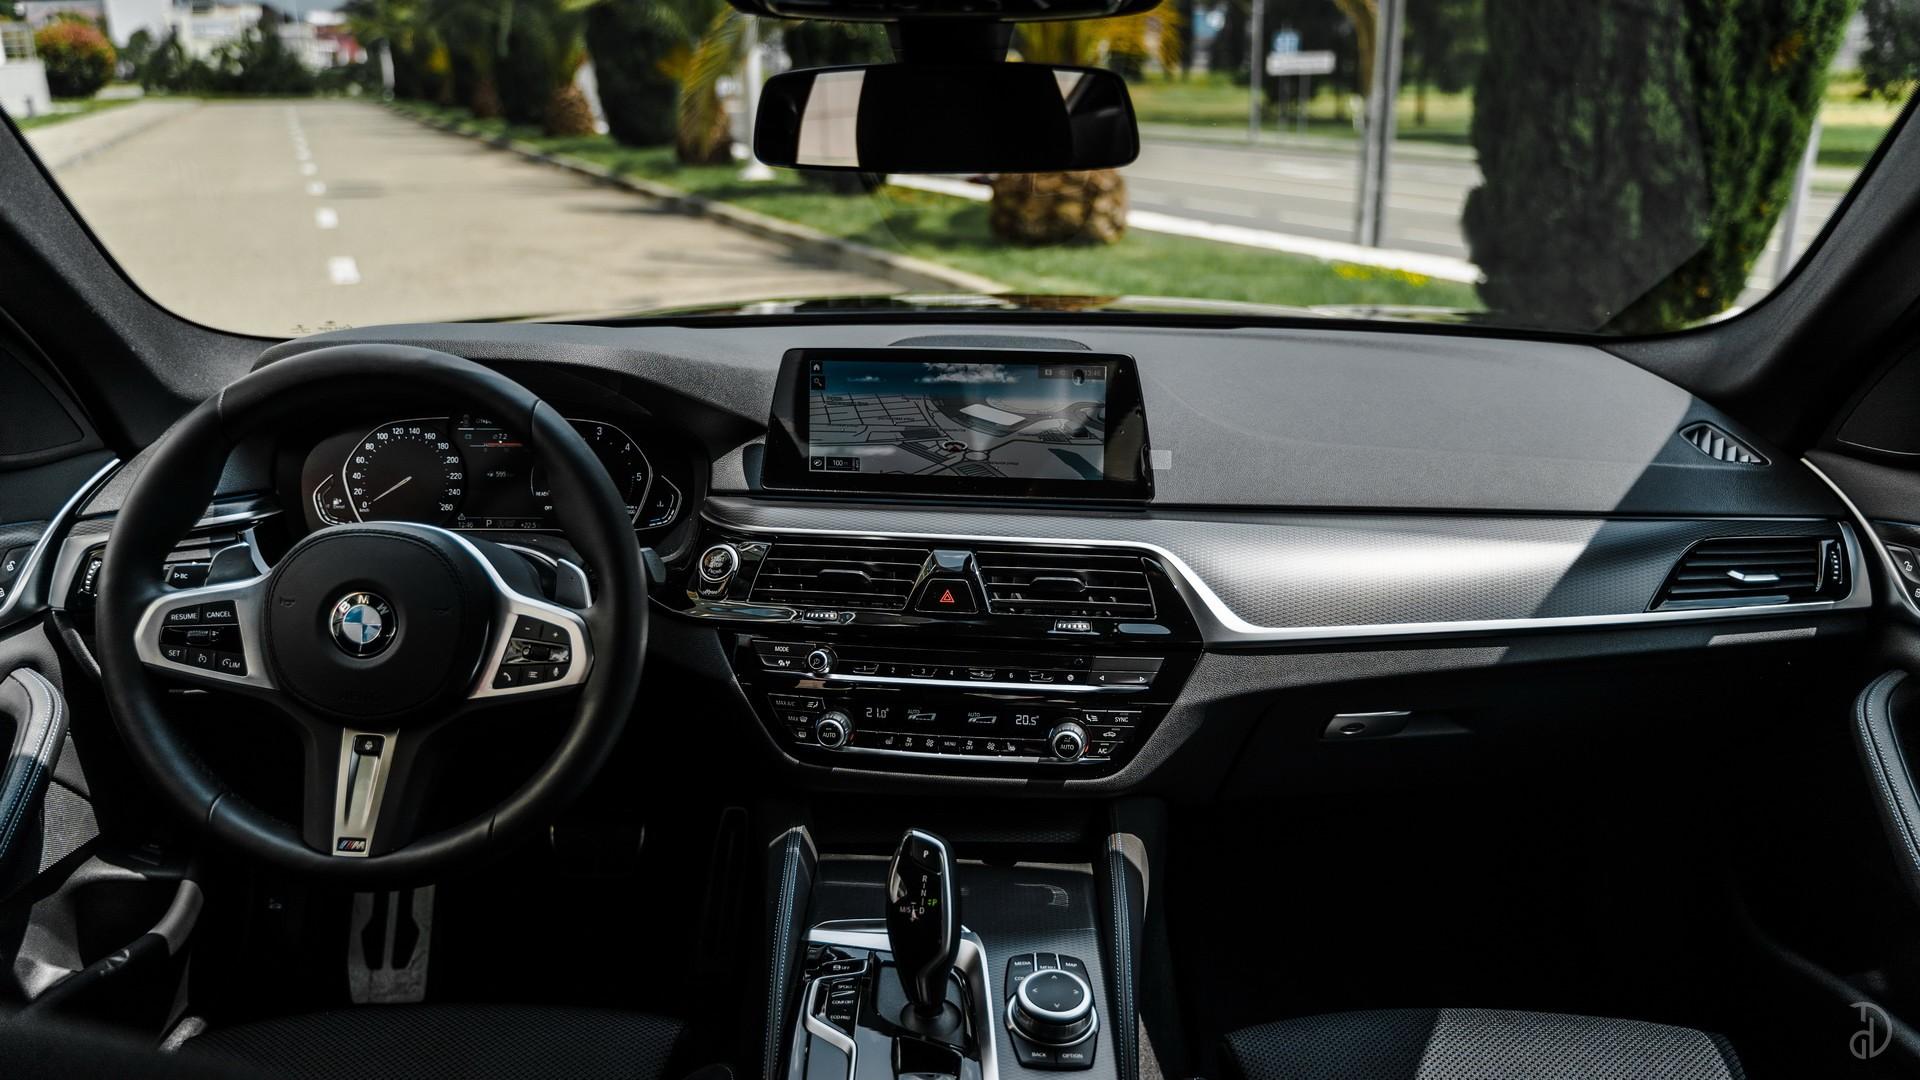 Аренда BMW 520d G30 в Сочи. Фото 11